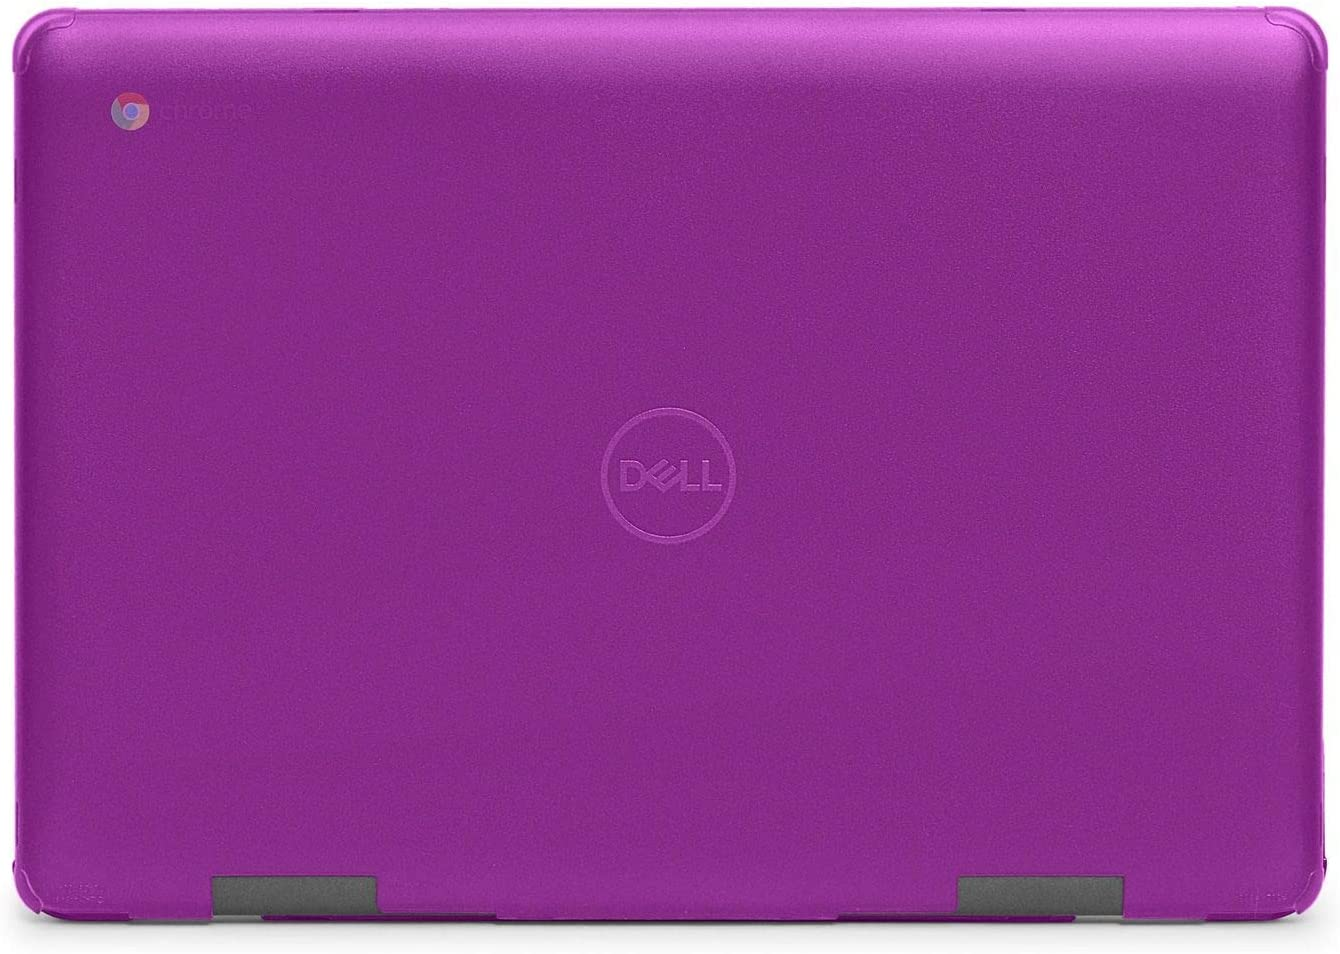 mCover Hard Shell Case for 2020 14-inch Dell Latitude 5400 Chromebook / 5410 Windows Laptop Computer-Dell LC5400 Purple